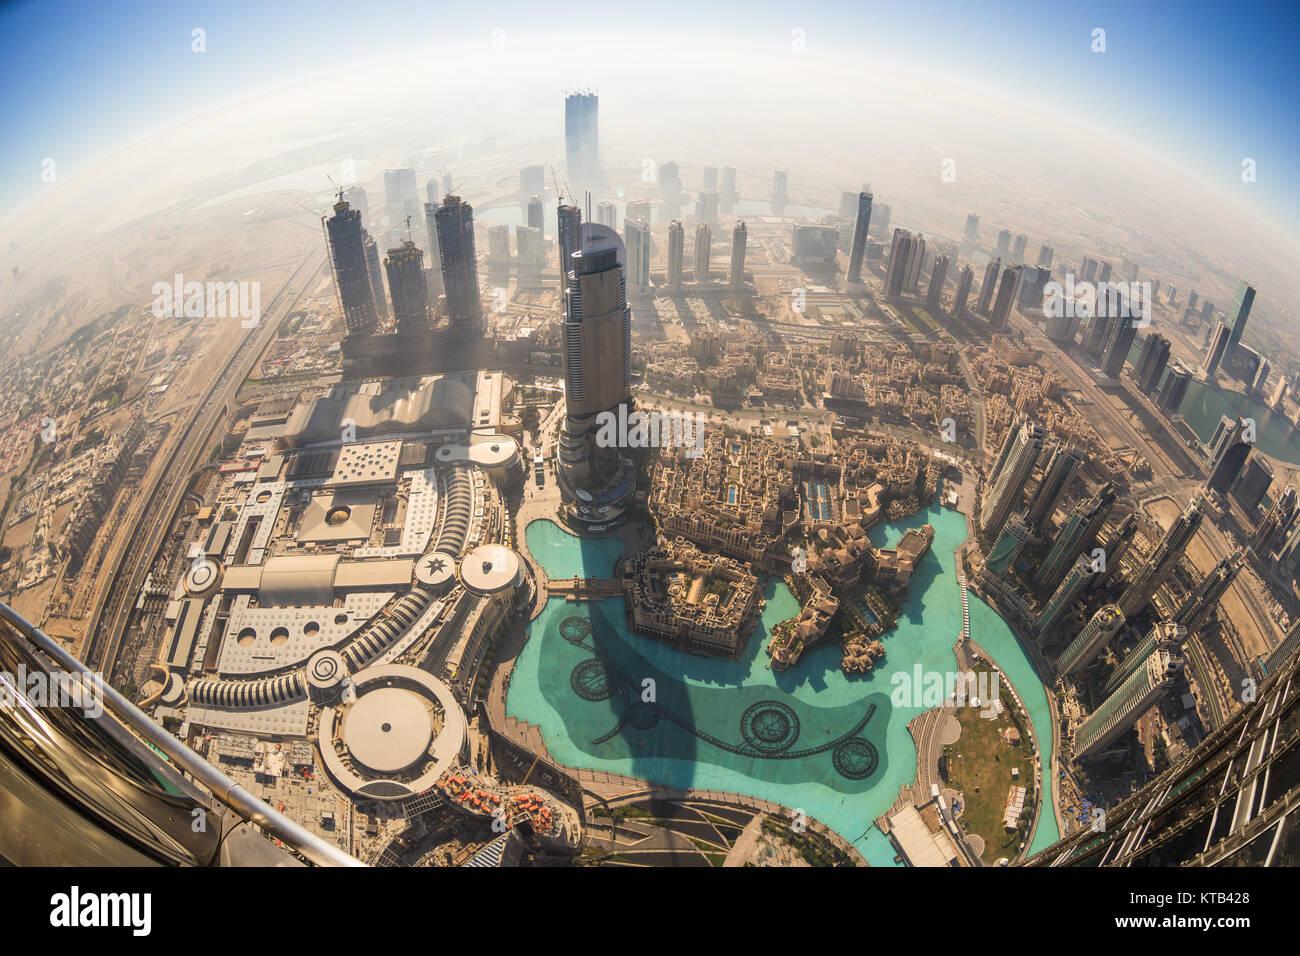 Aerial view of Downtown Dubai from Burj Khalifa, Dubai, United Arab Emirates. - Stock Image